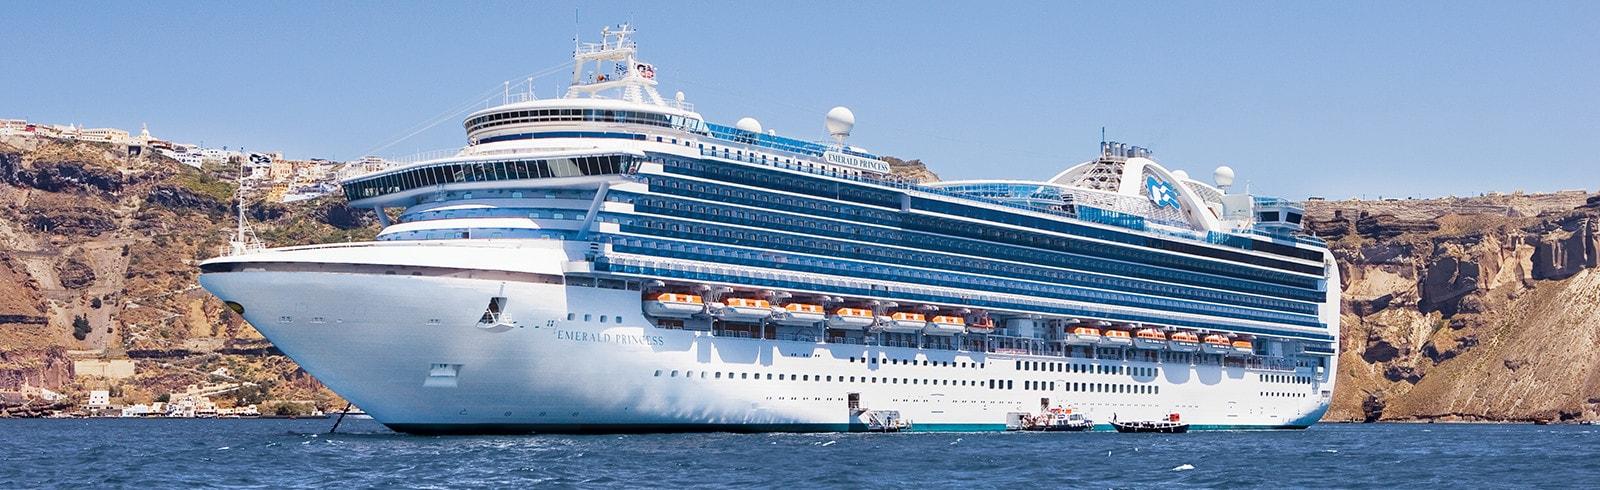 princess_south_pacific_cruise.jpg